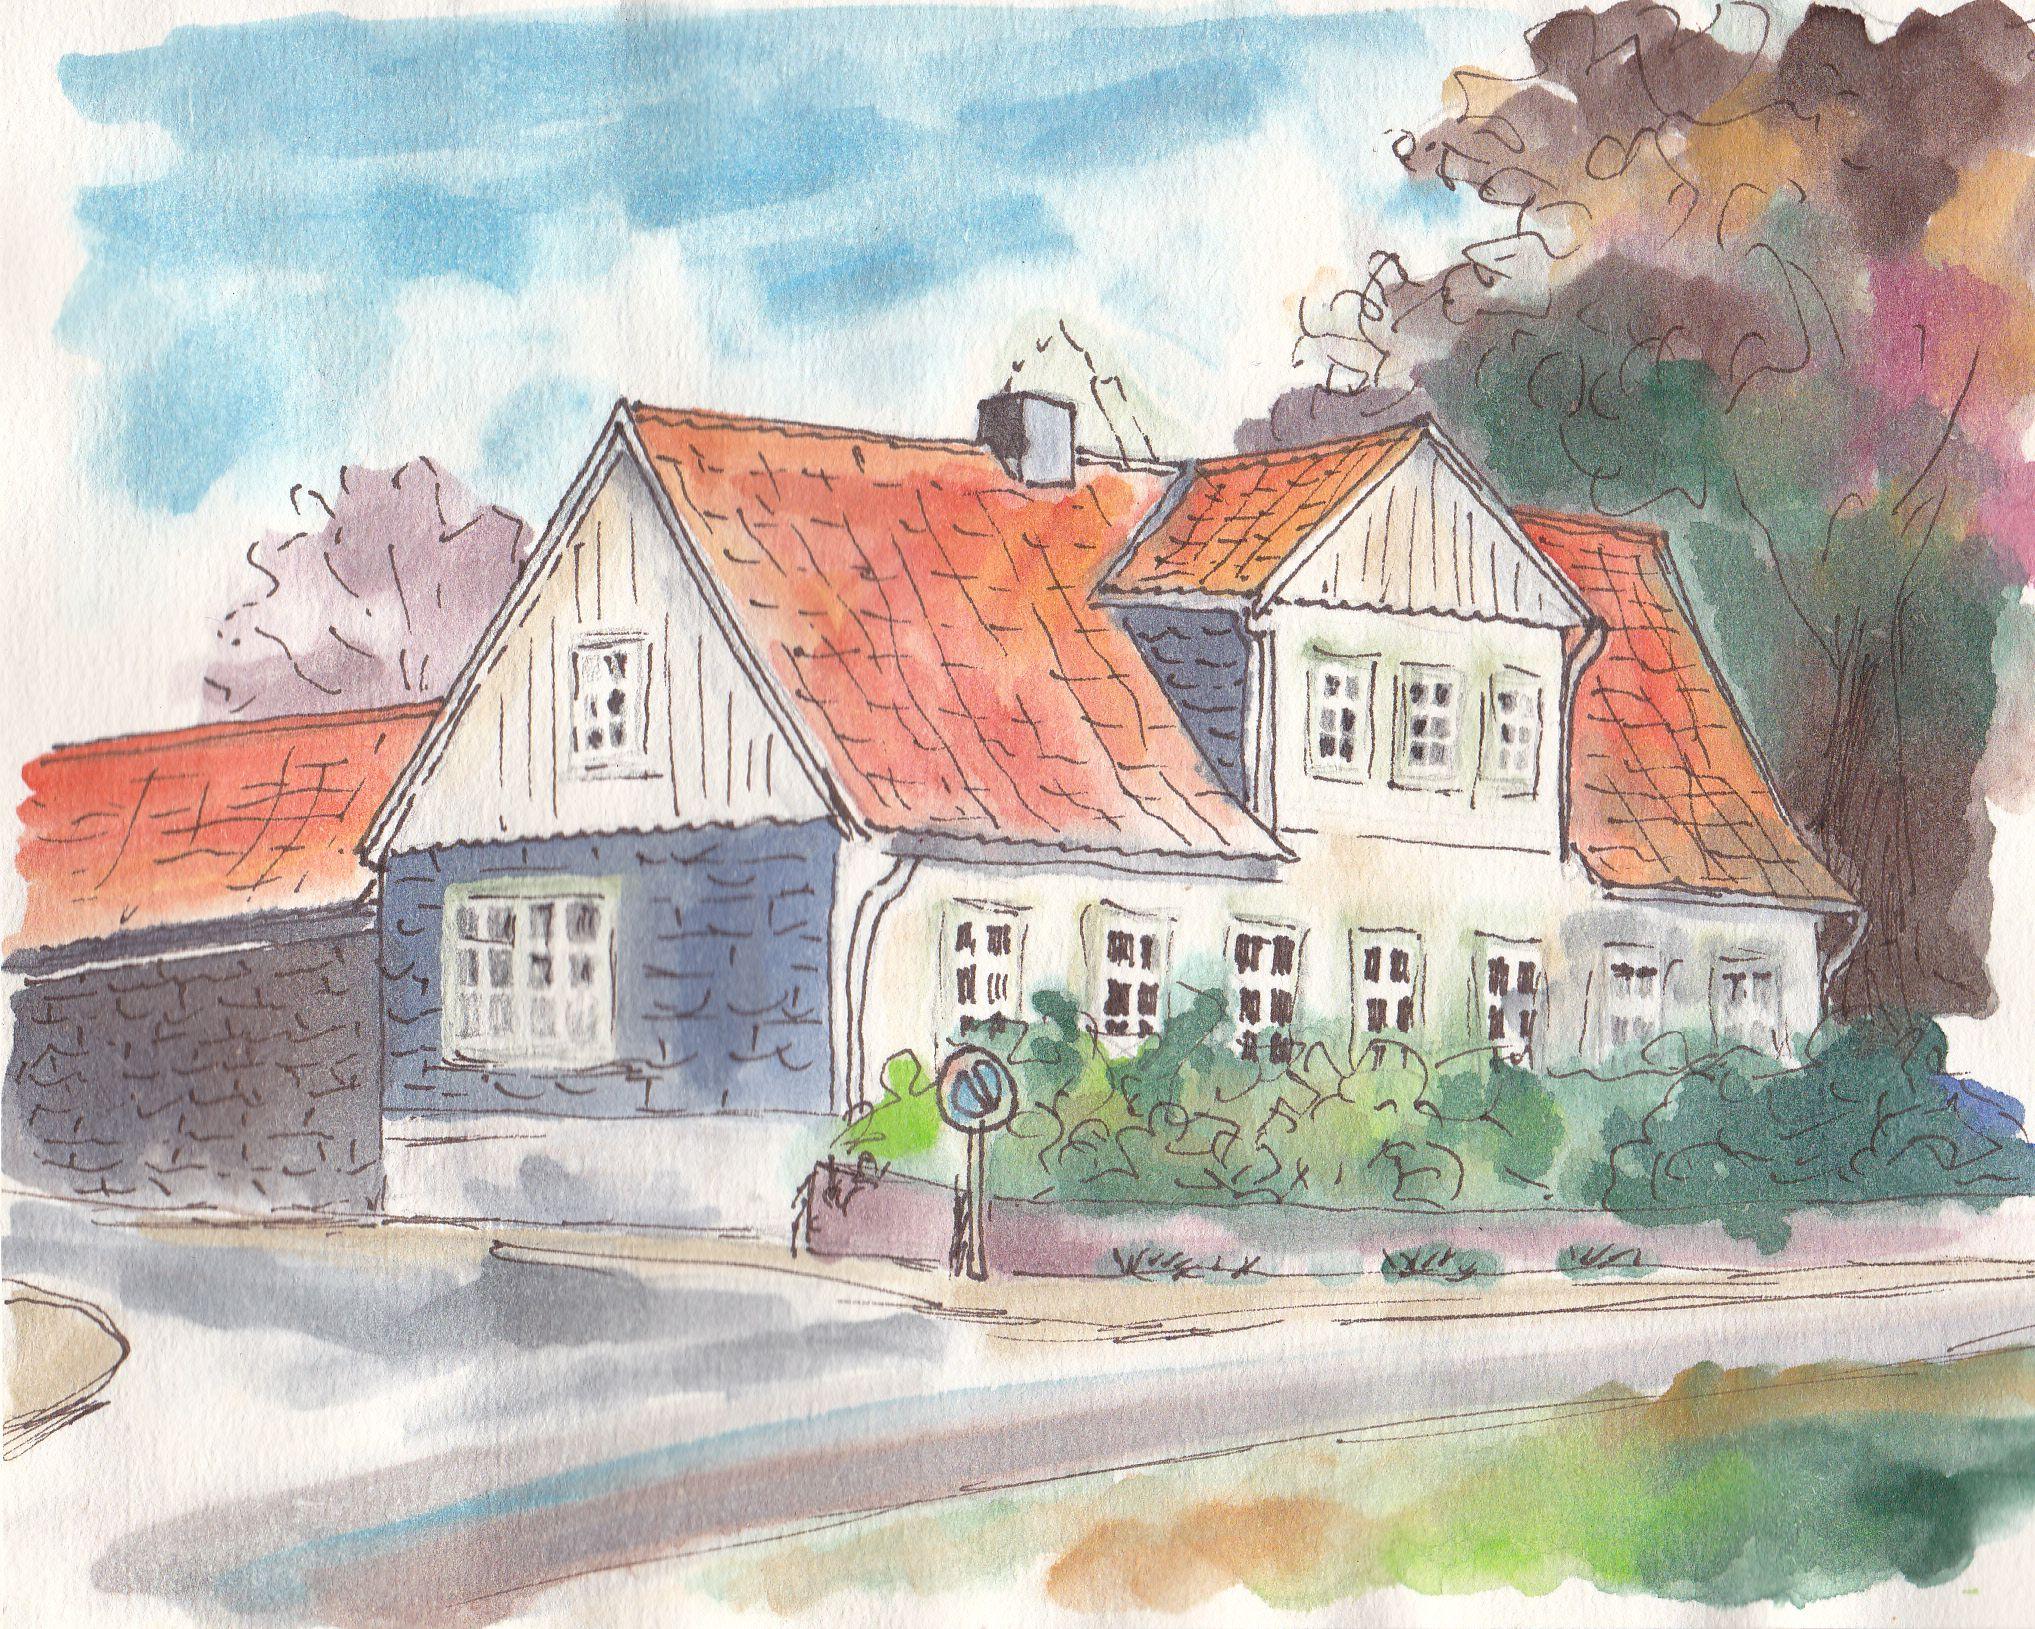 "An der Dahlenburger Landstraße, Lüneburg. Aquarell auf Zeichenpapier, 14 x 18 cm, 40 € m. R.. Watercolours on drawing paper, 5.5"" x 7.1"", $50 w/frame."